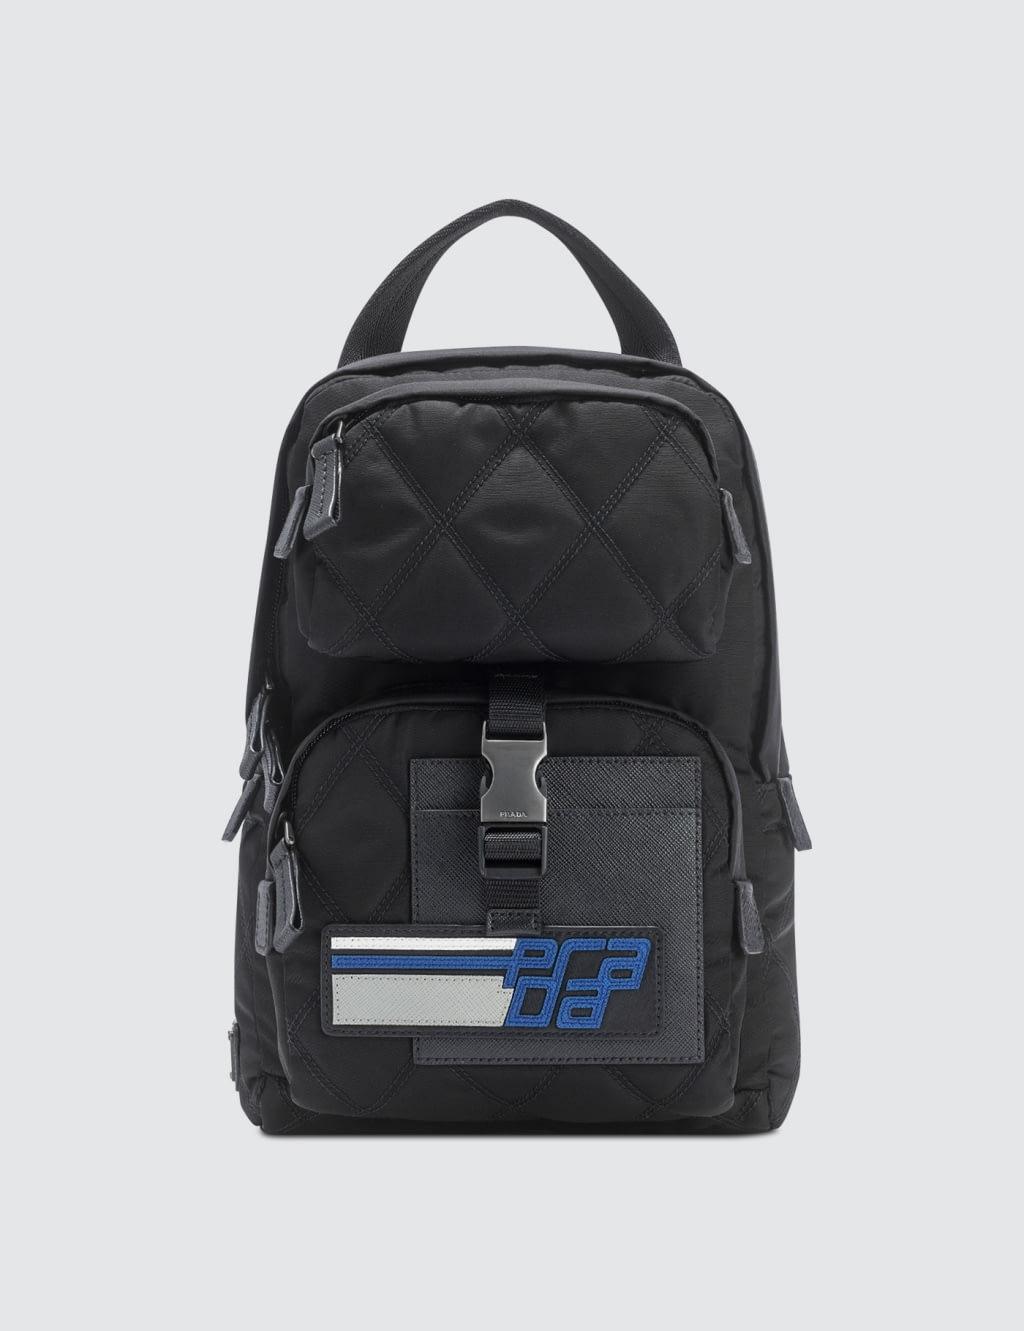 487774257077 Black Nylon Backpack Prada- Fenix Toulouse Handball